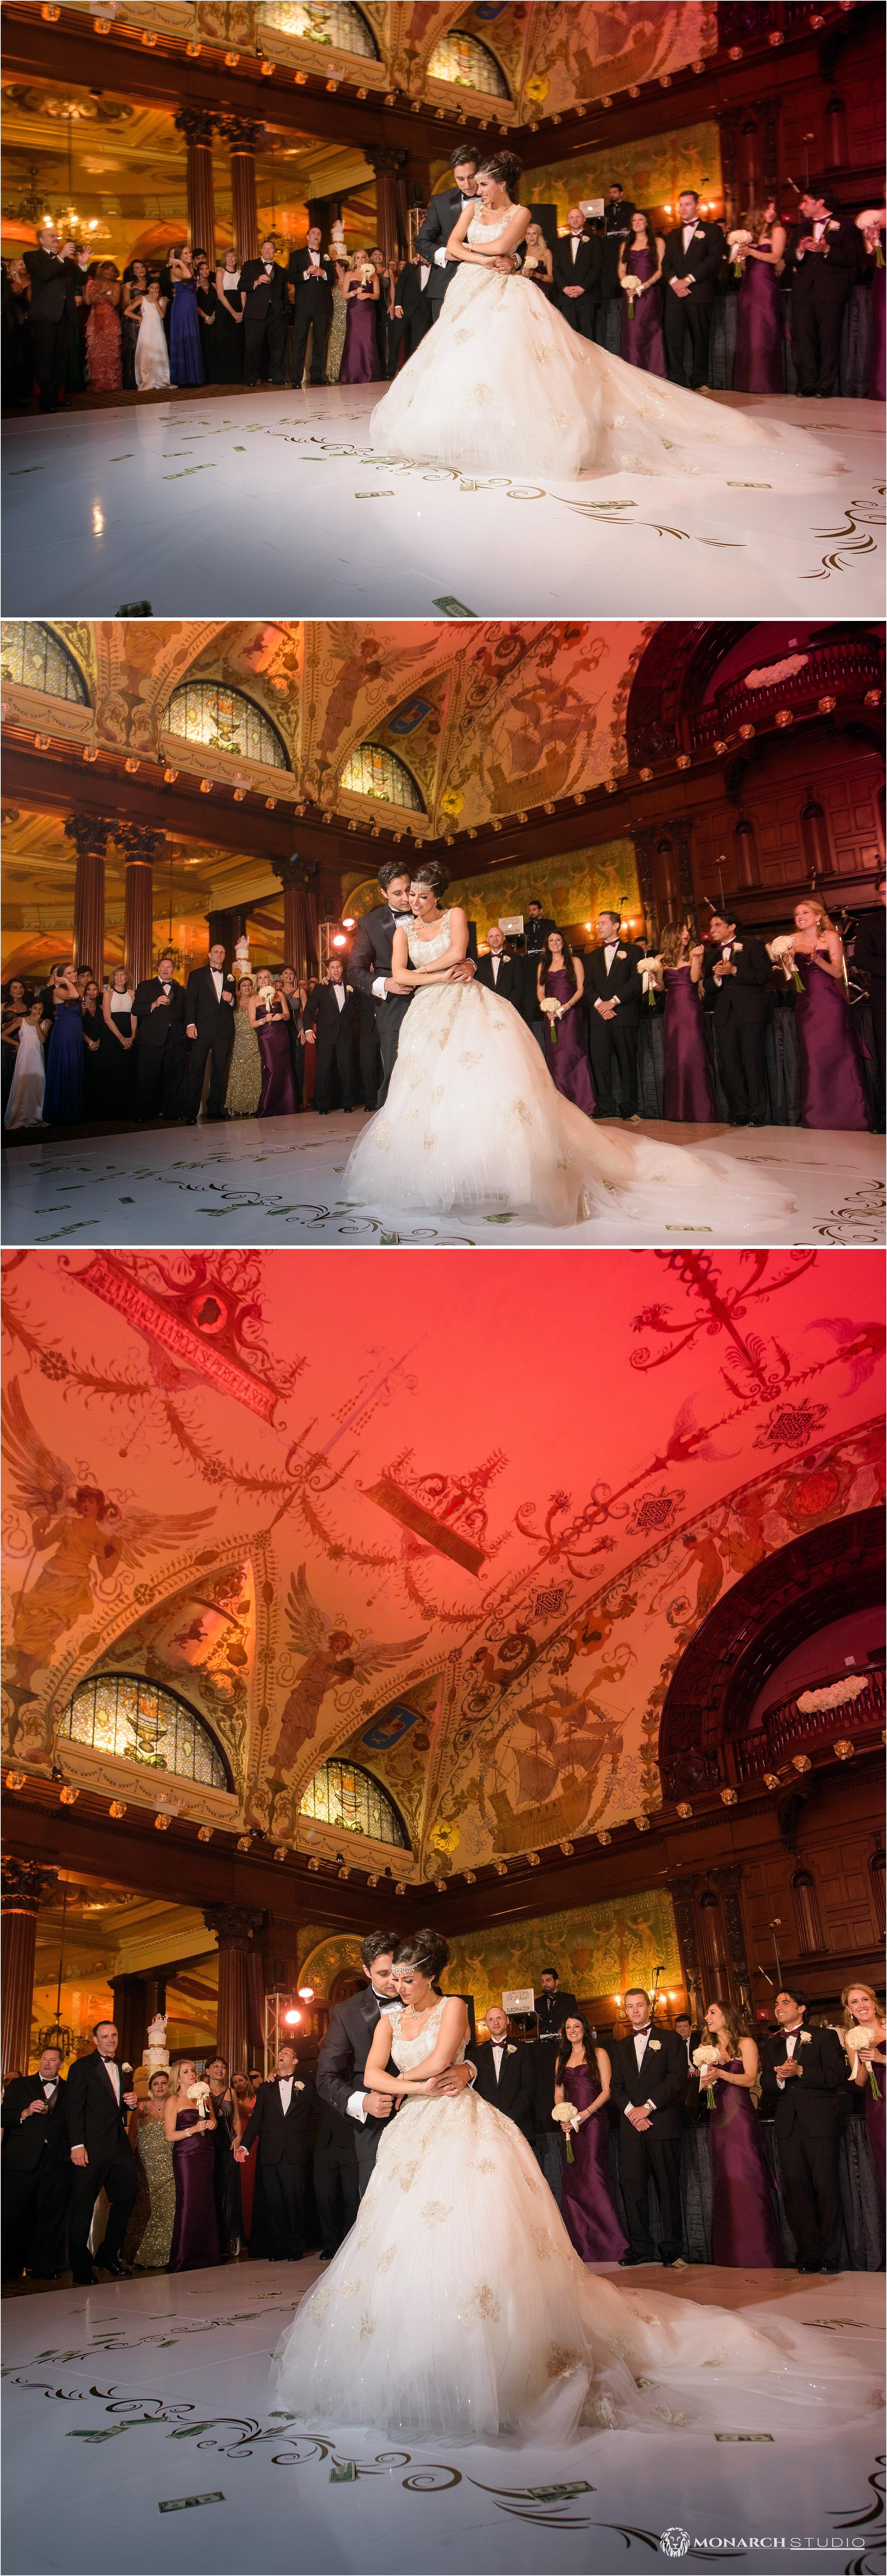 Persian-Aghd-Wedding-Photographer- سفره عقد-063.jpg